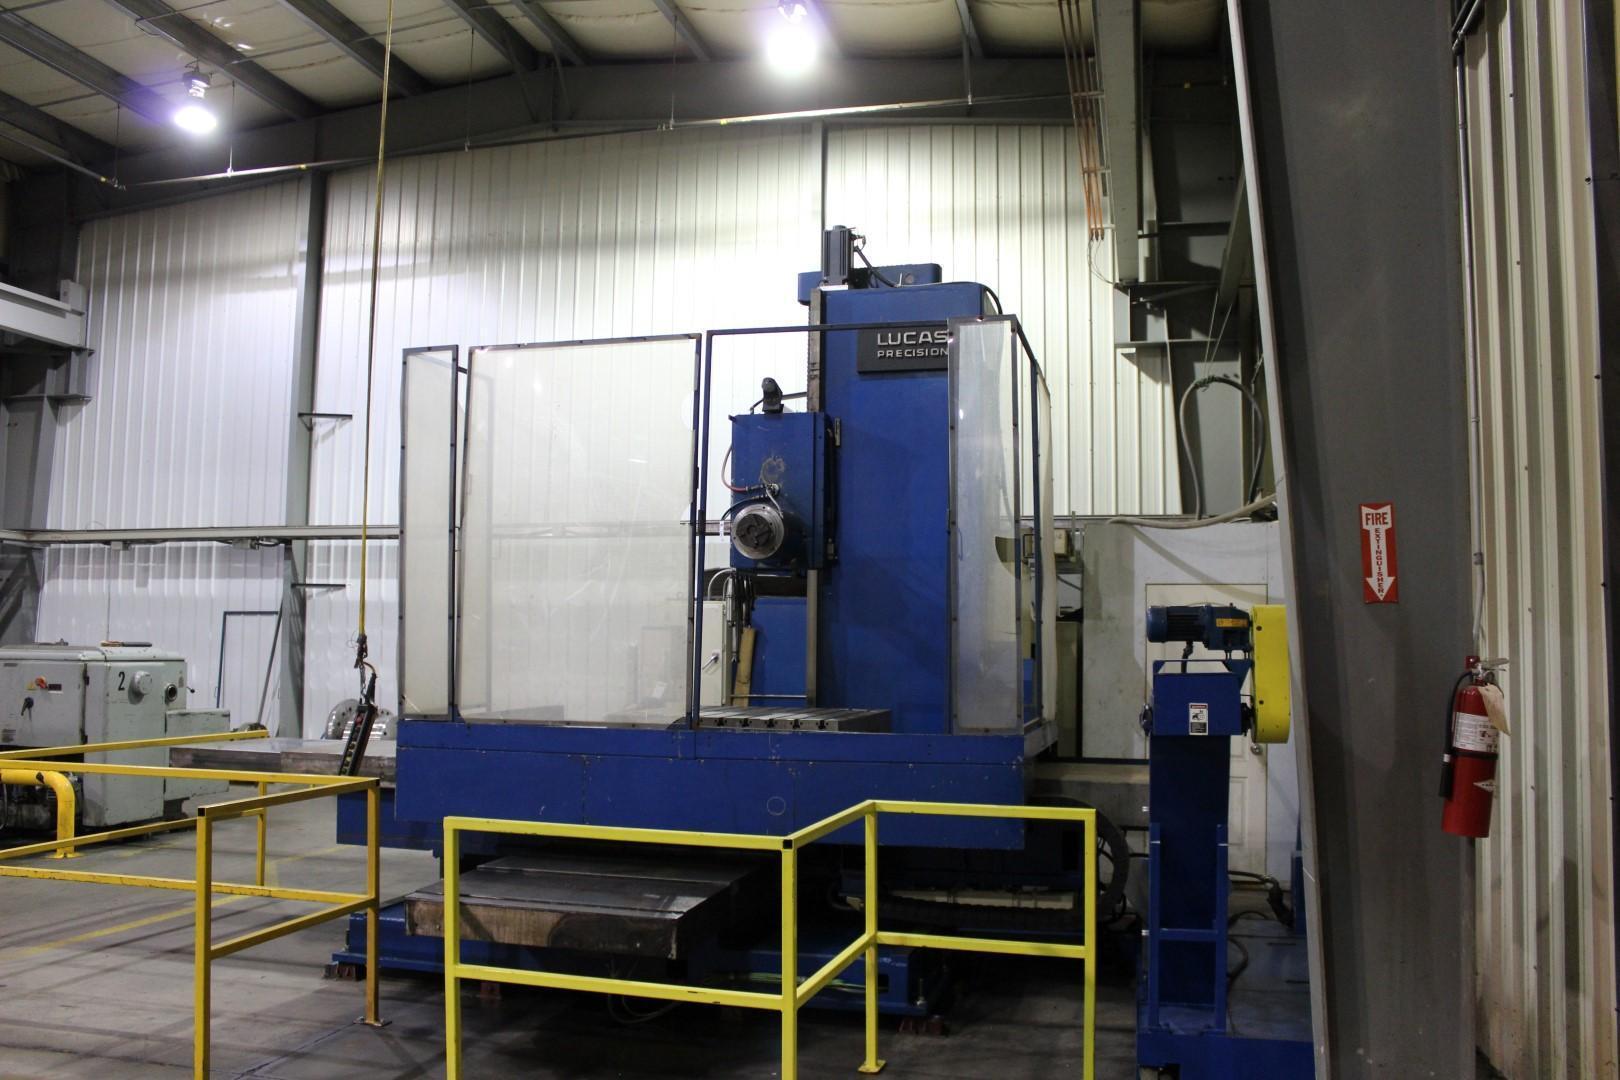 "5"" Lucas CNC Horizontal Boring Mill"